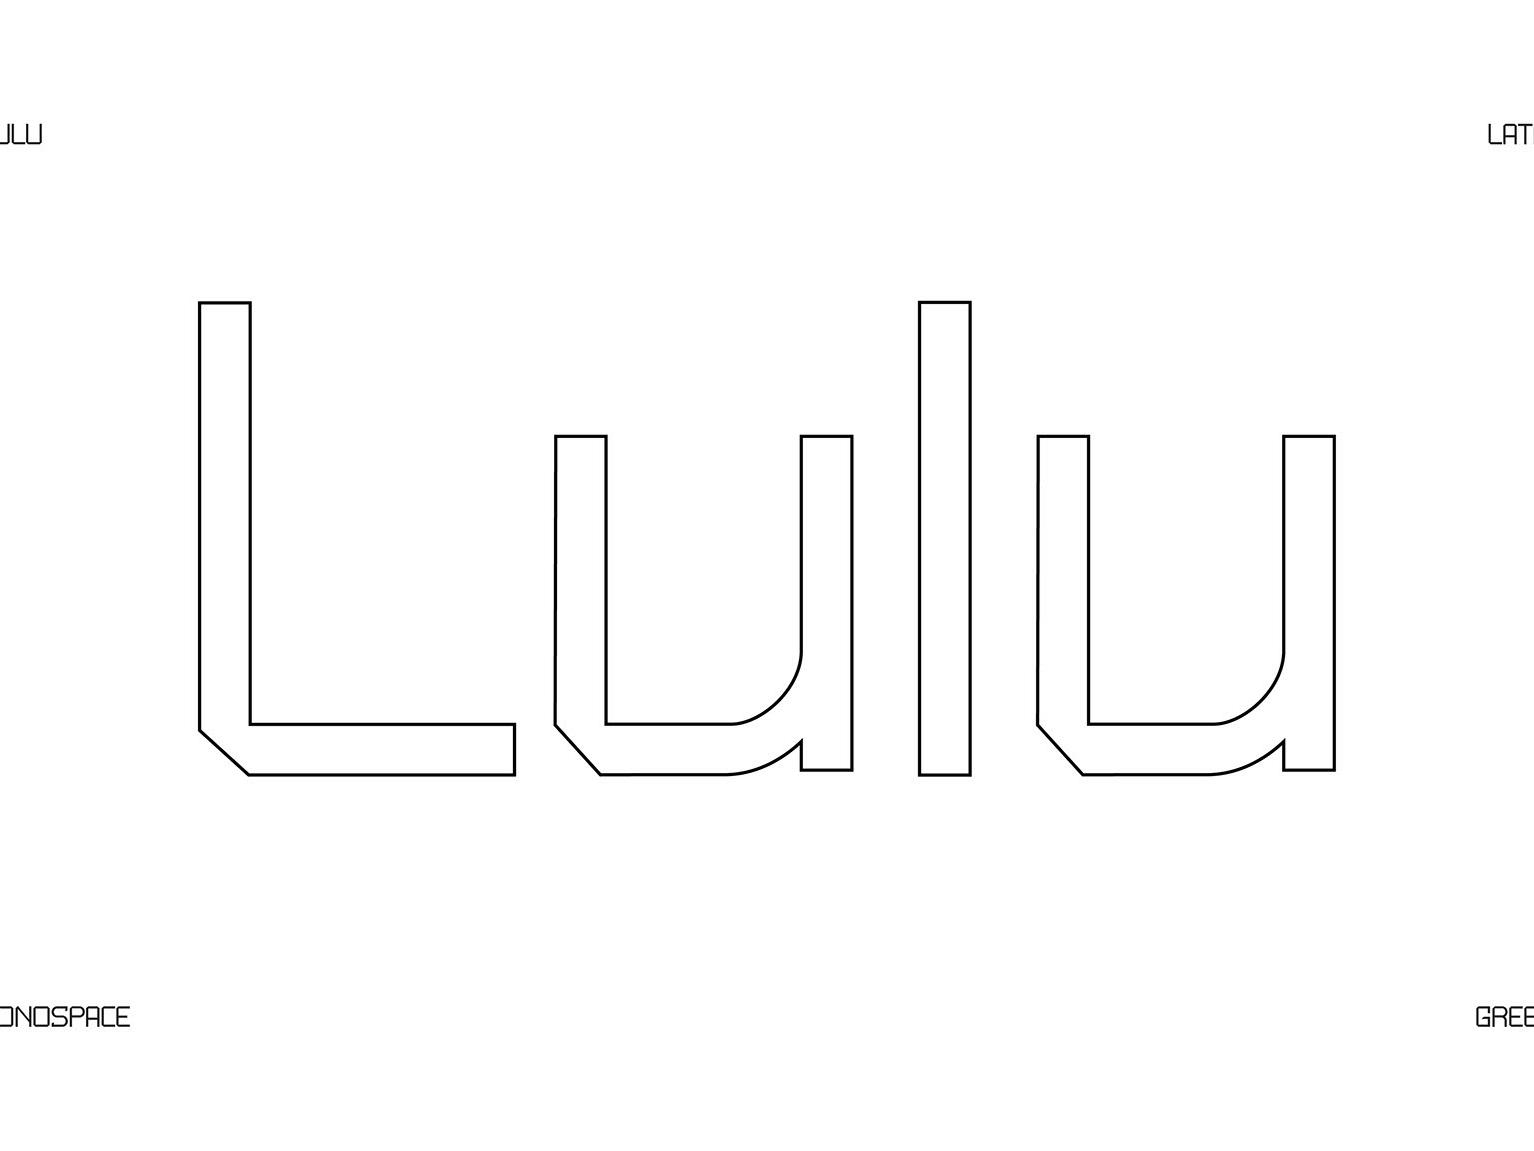 Lulu Monospace Free Font monospace free font typography download free font download